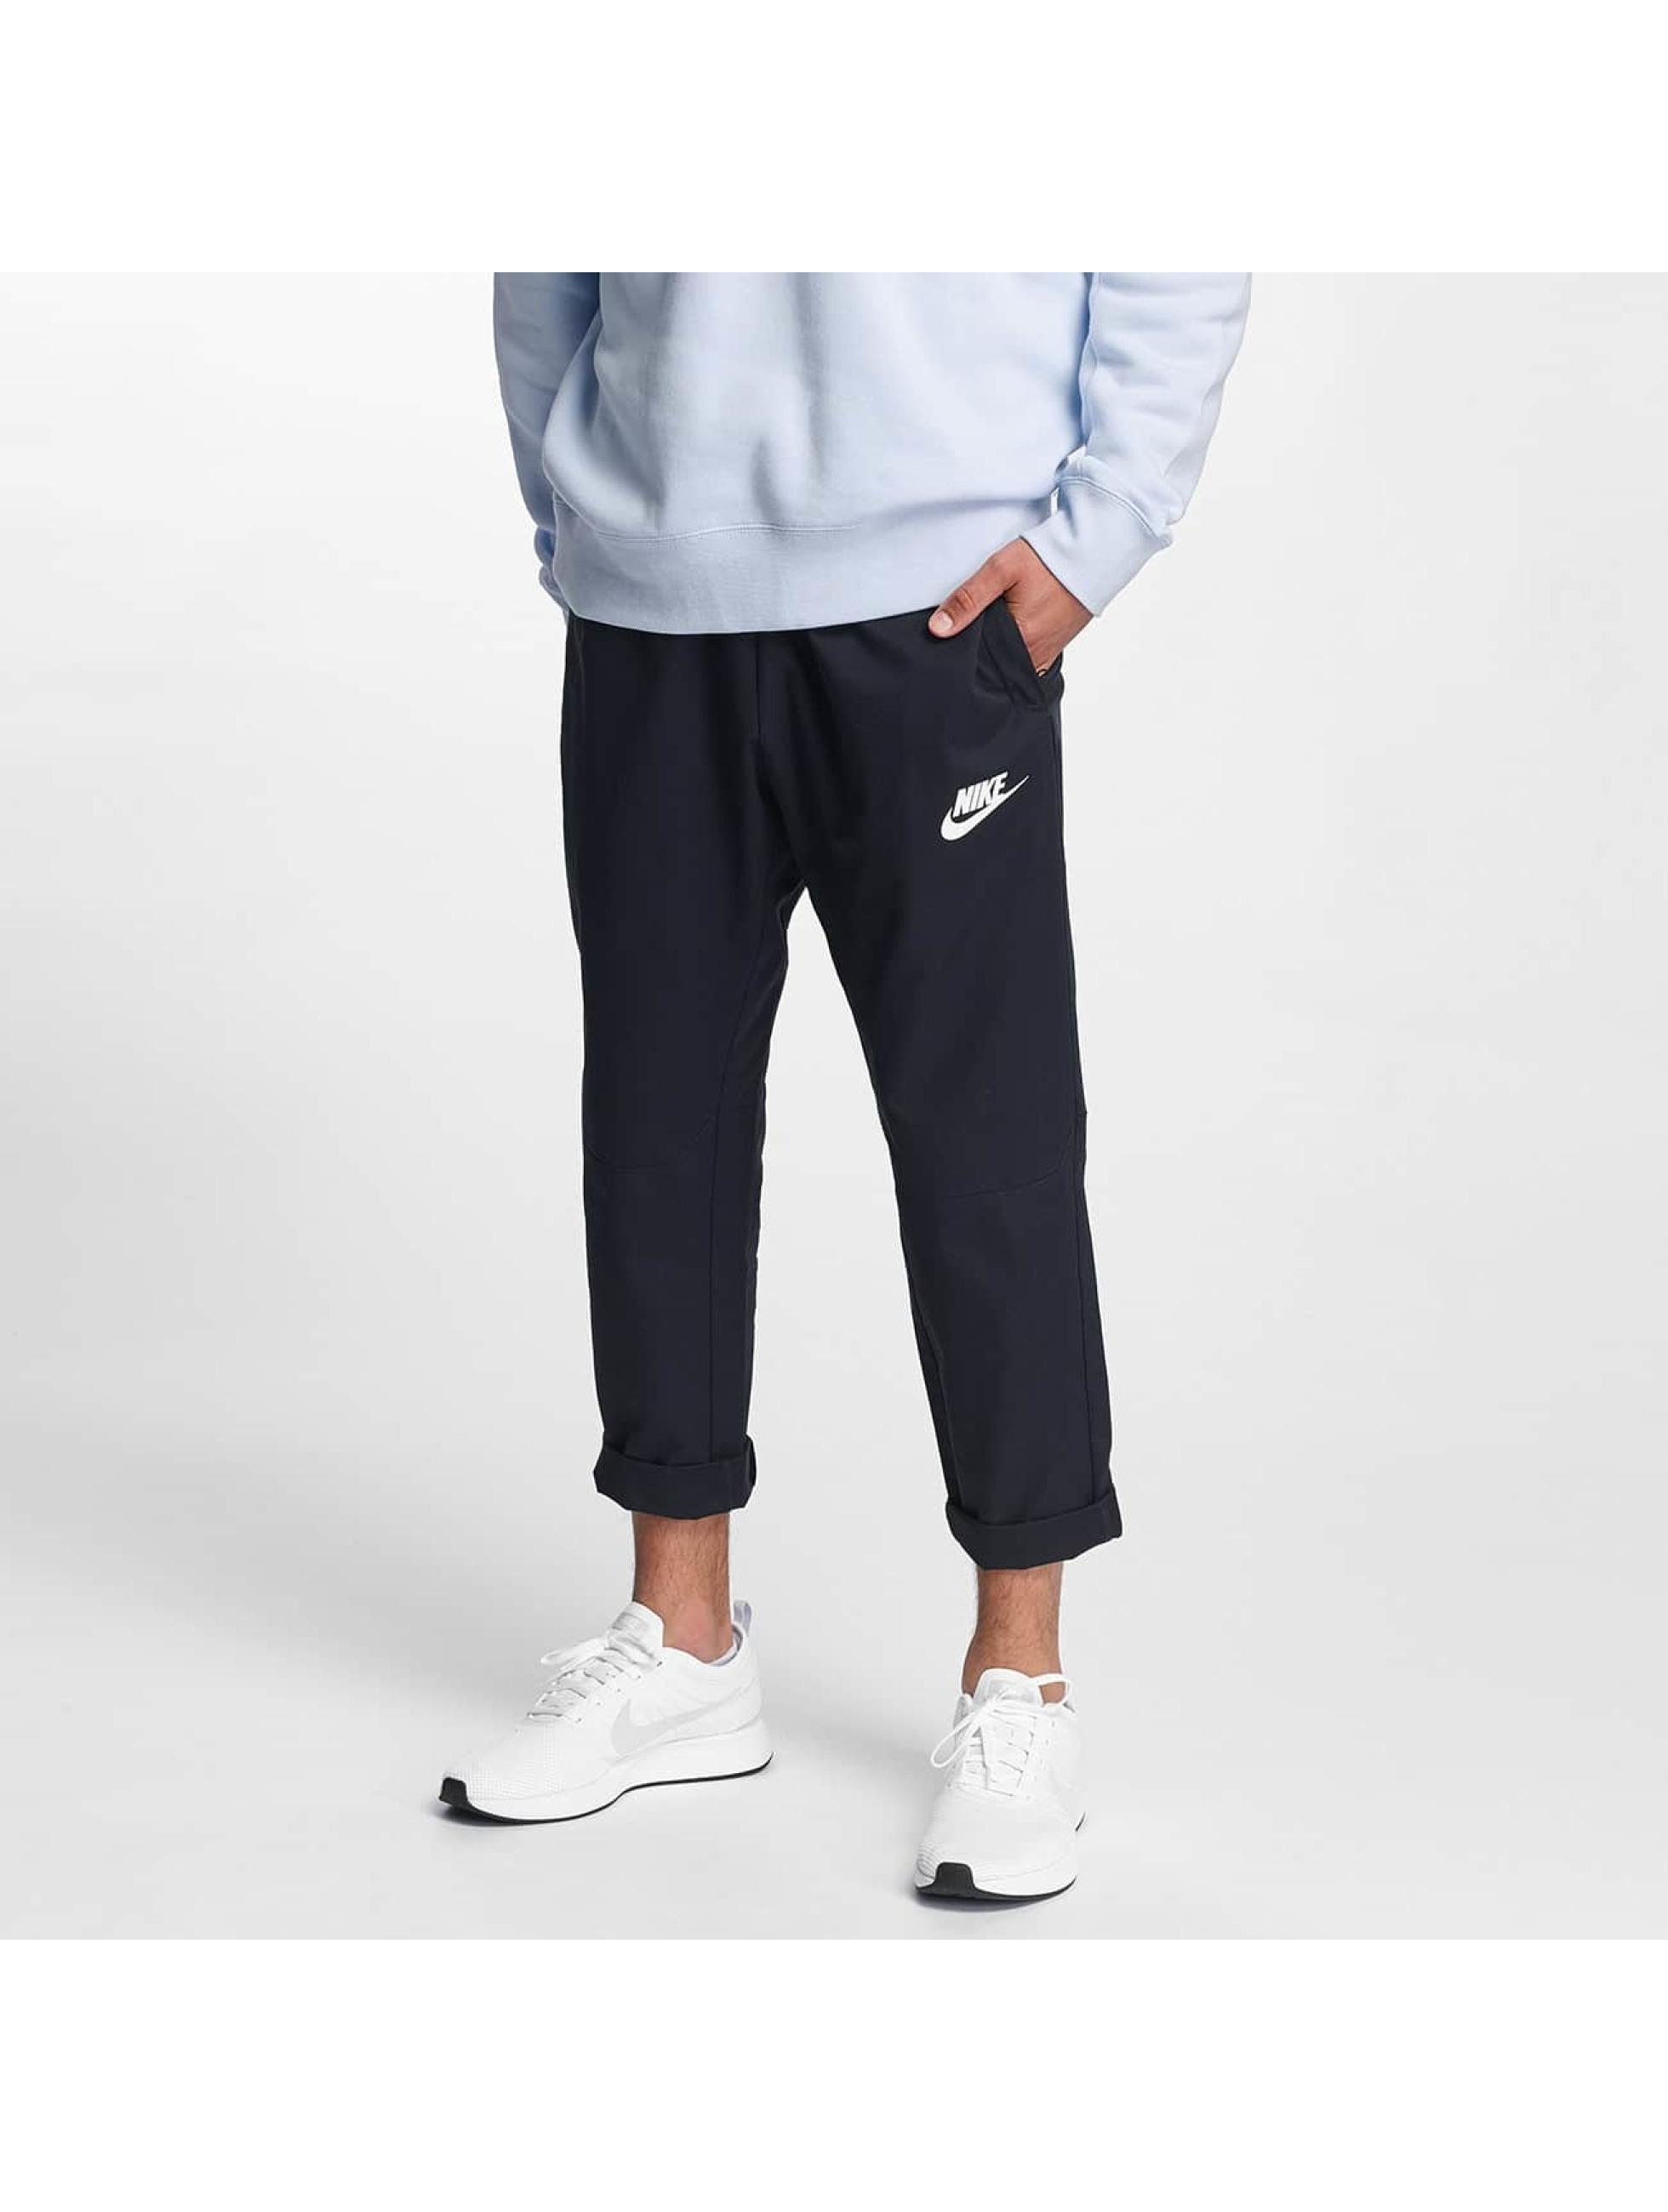 Nike Männer Jogginghose AV15 in schwarz